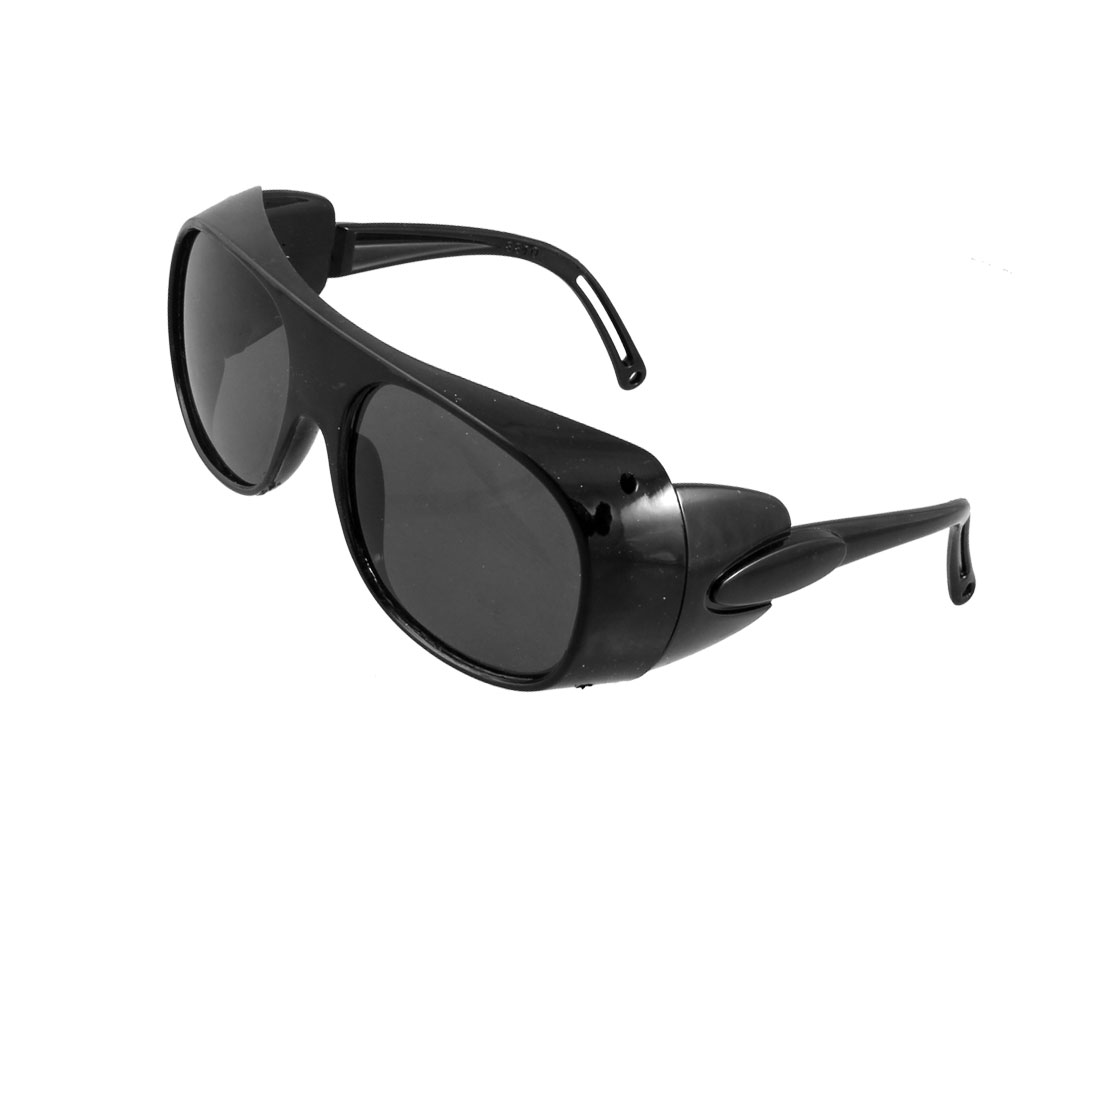 "5.1"" Width Black Frame Dark Gray Rectangle Lens Protective Goggles"